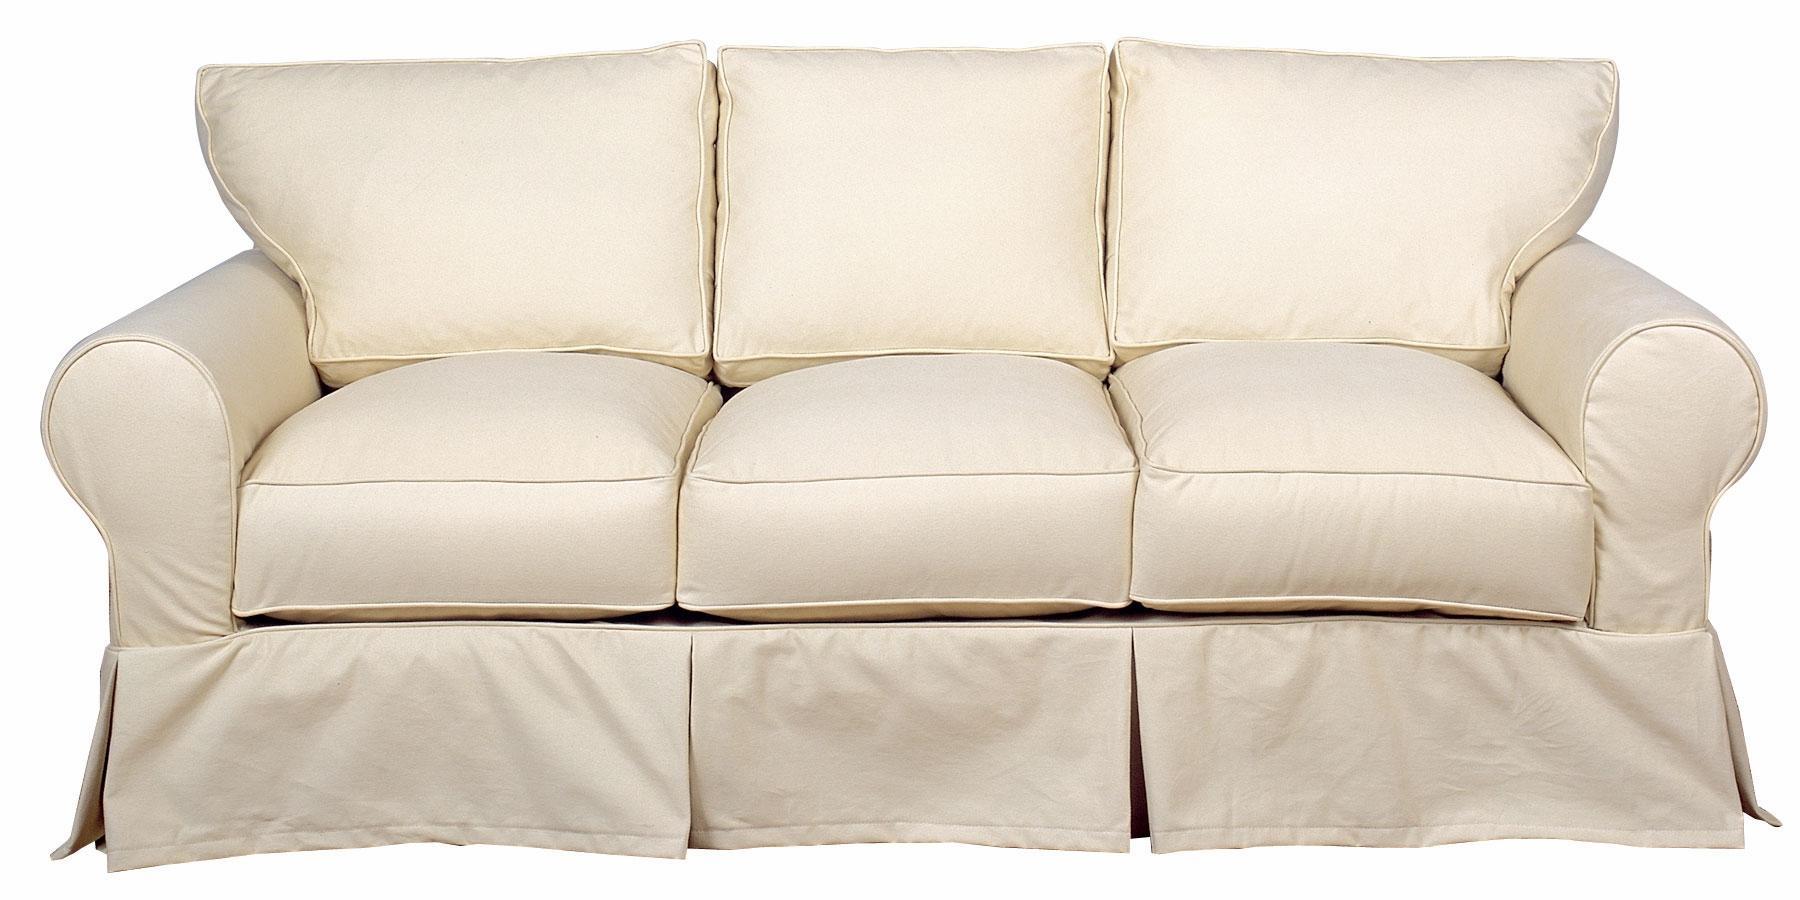 Sleeper Sofa Cover | Sofa Gallery | Kengire Inside Sleeper Sofa Slipcovers (View 19 of 20)